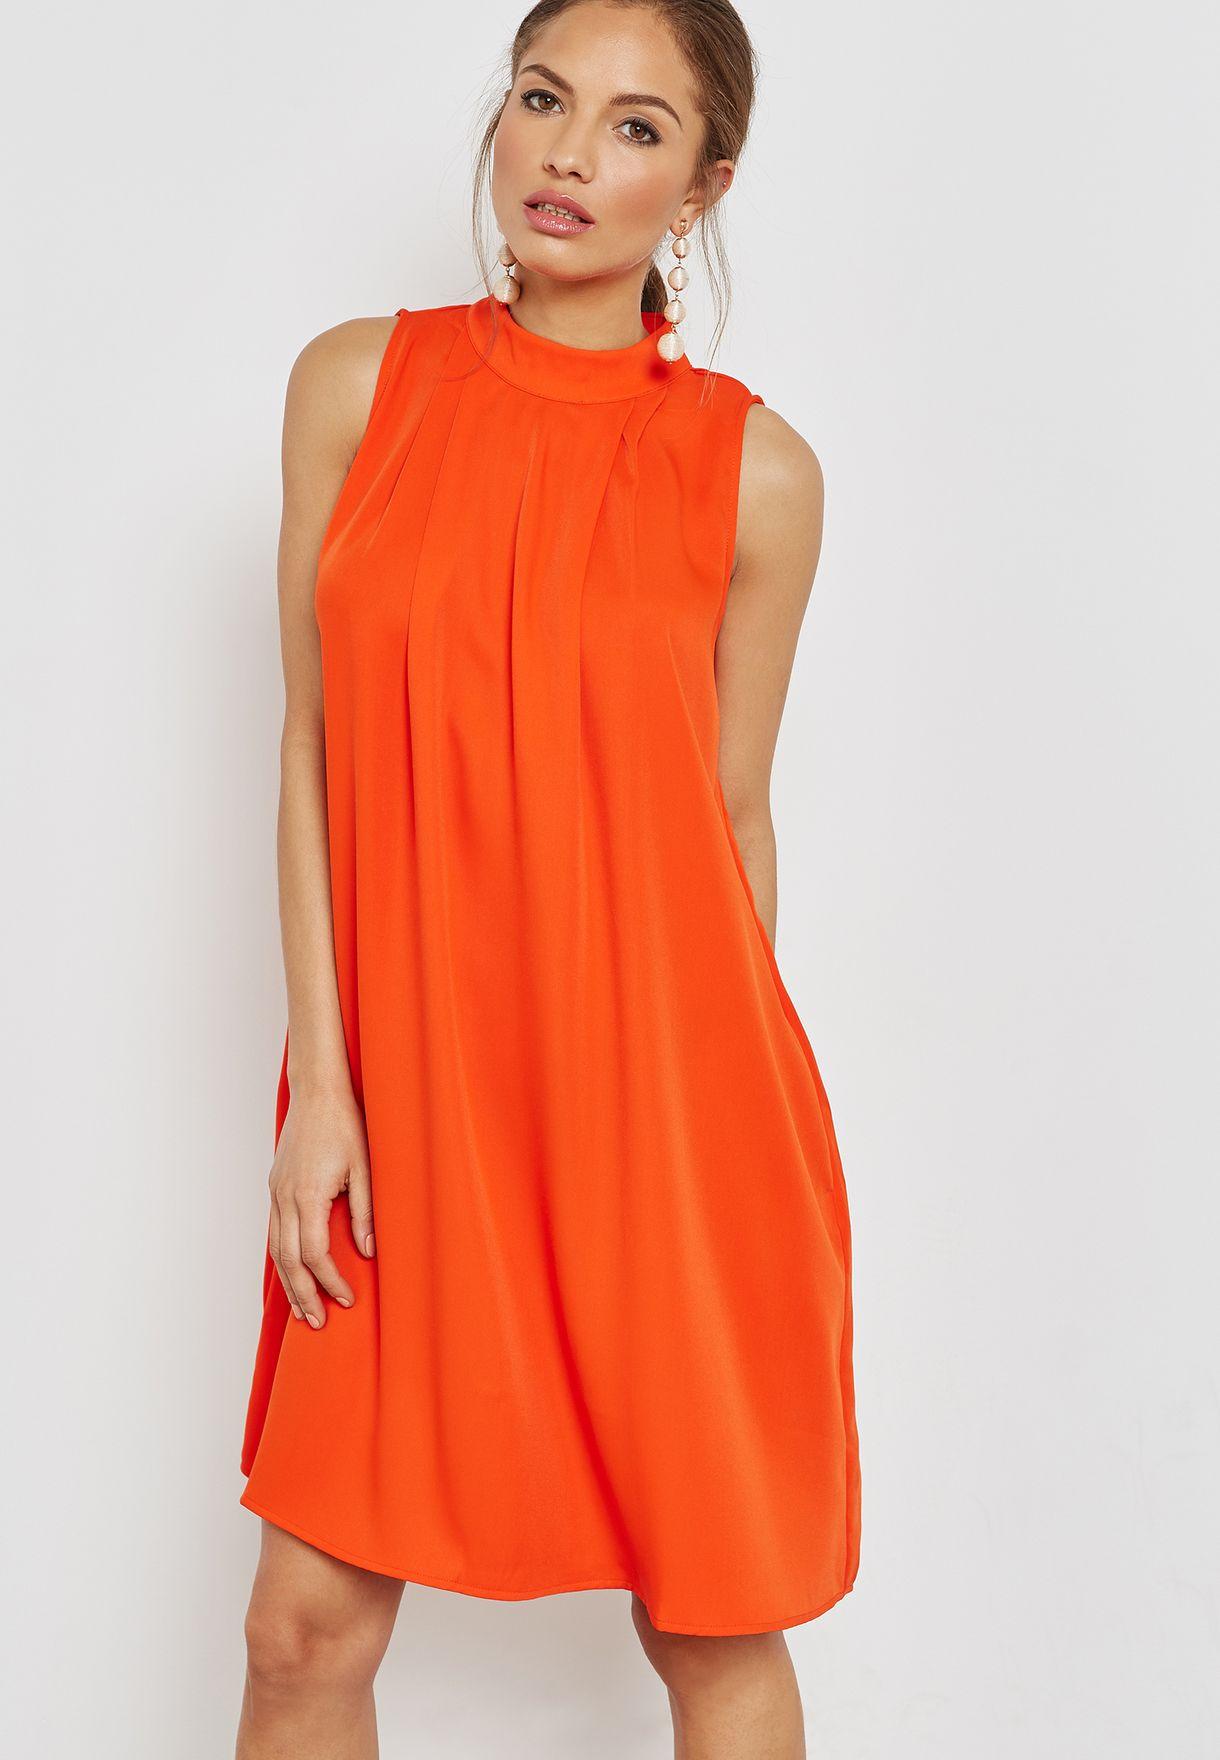 adedaa847868e5 Shop Yas orange Pleated Dress 26010751 for Women in Saudi - YA500AT36QBZ